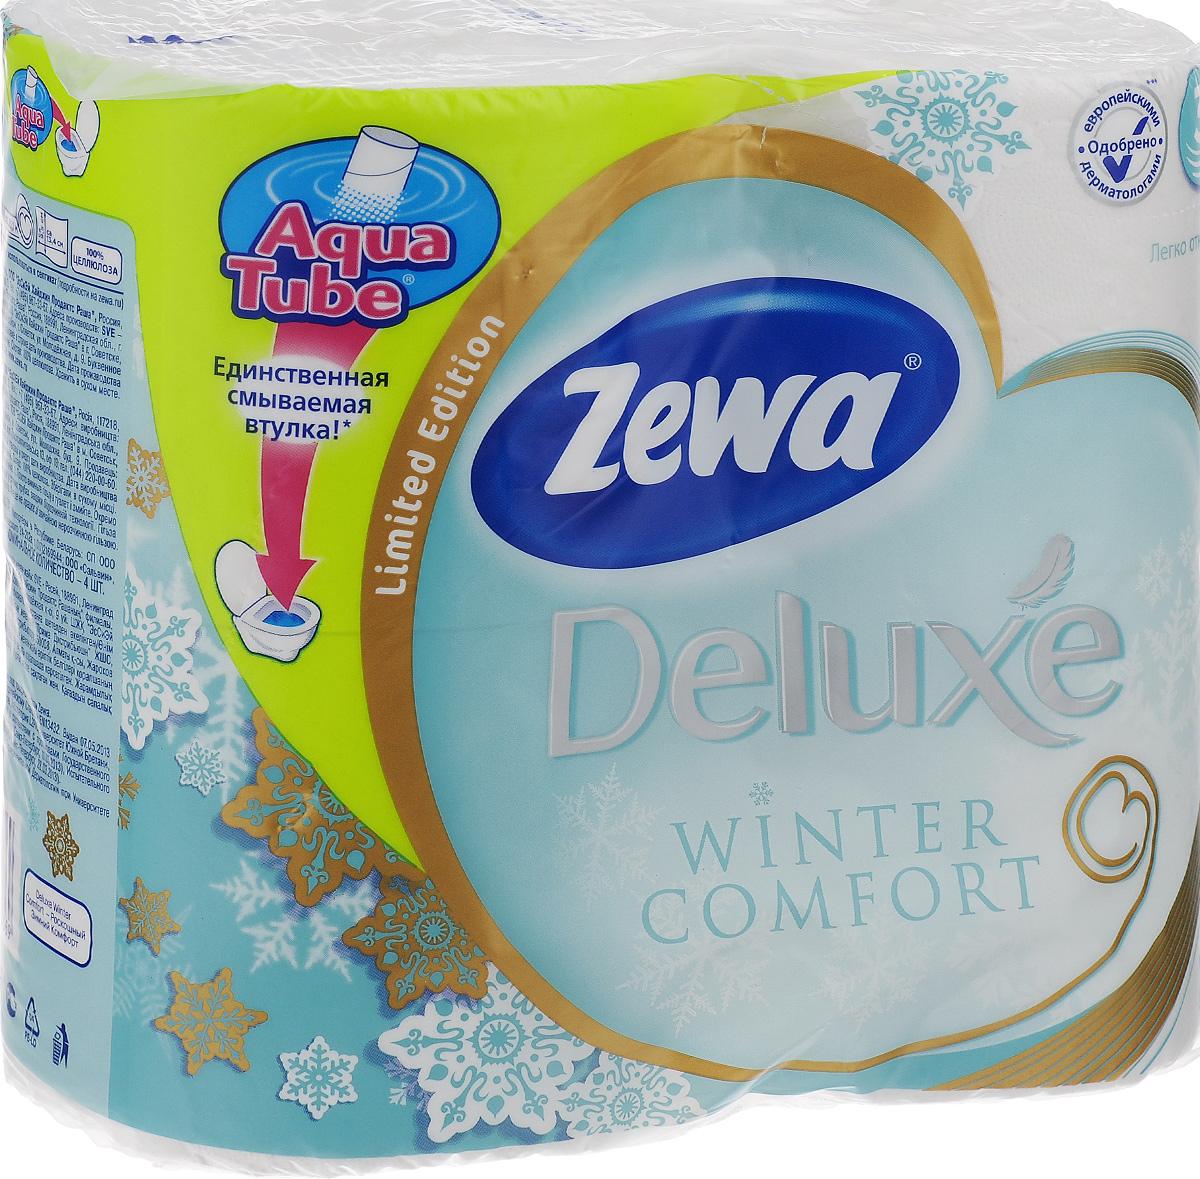 Туалетная бумага Zewa Deluxe. Winter Comfort, трехслойная, цвет: белый, 4 рулона zewa everyday 100